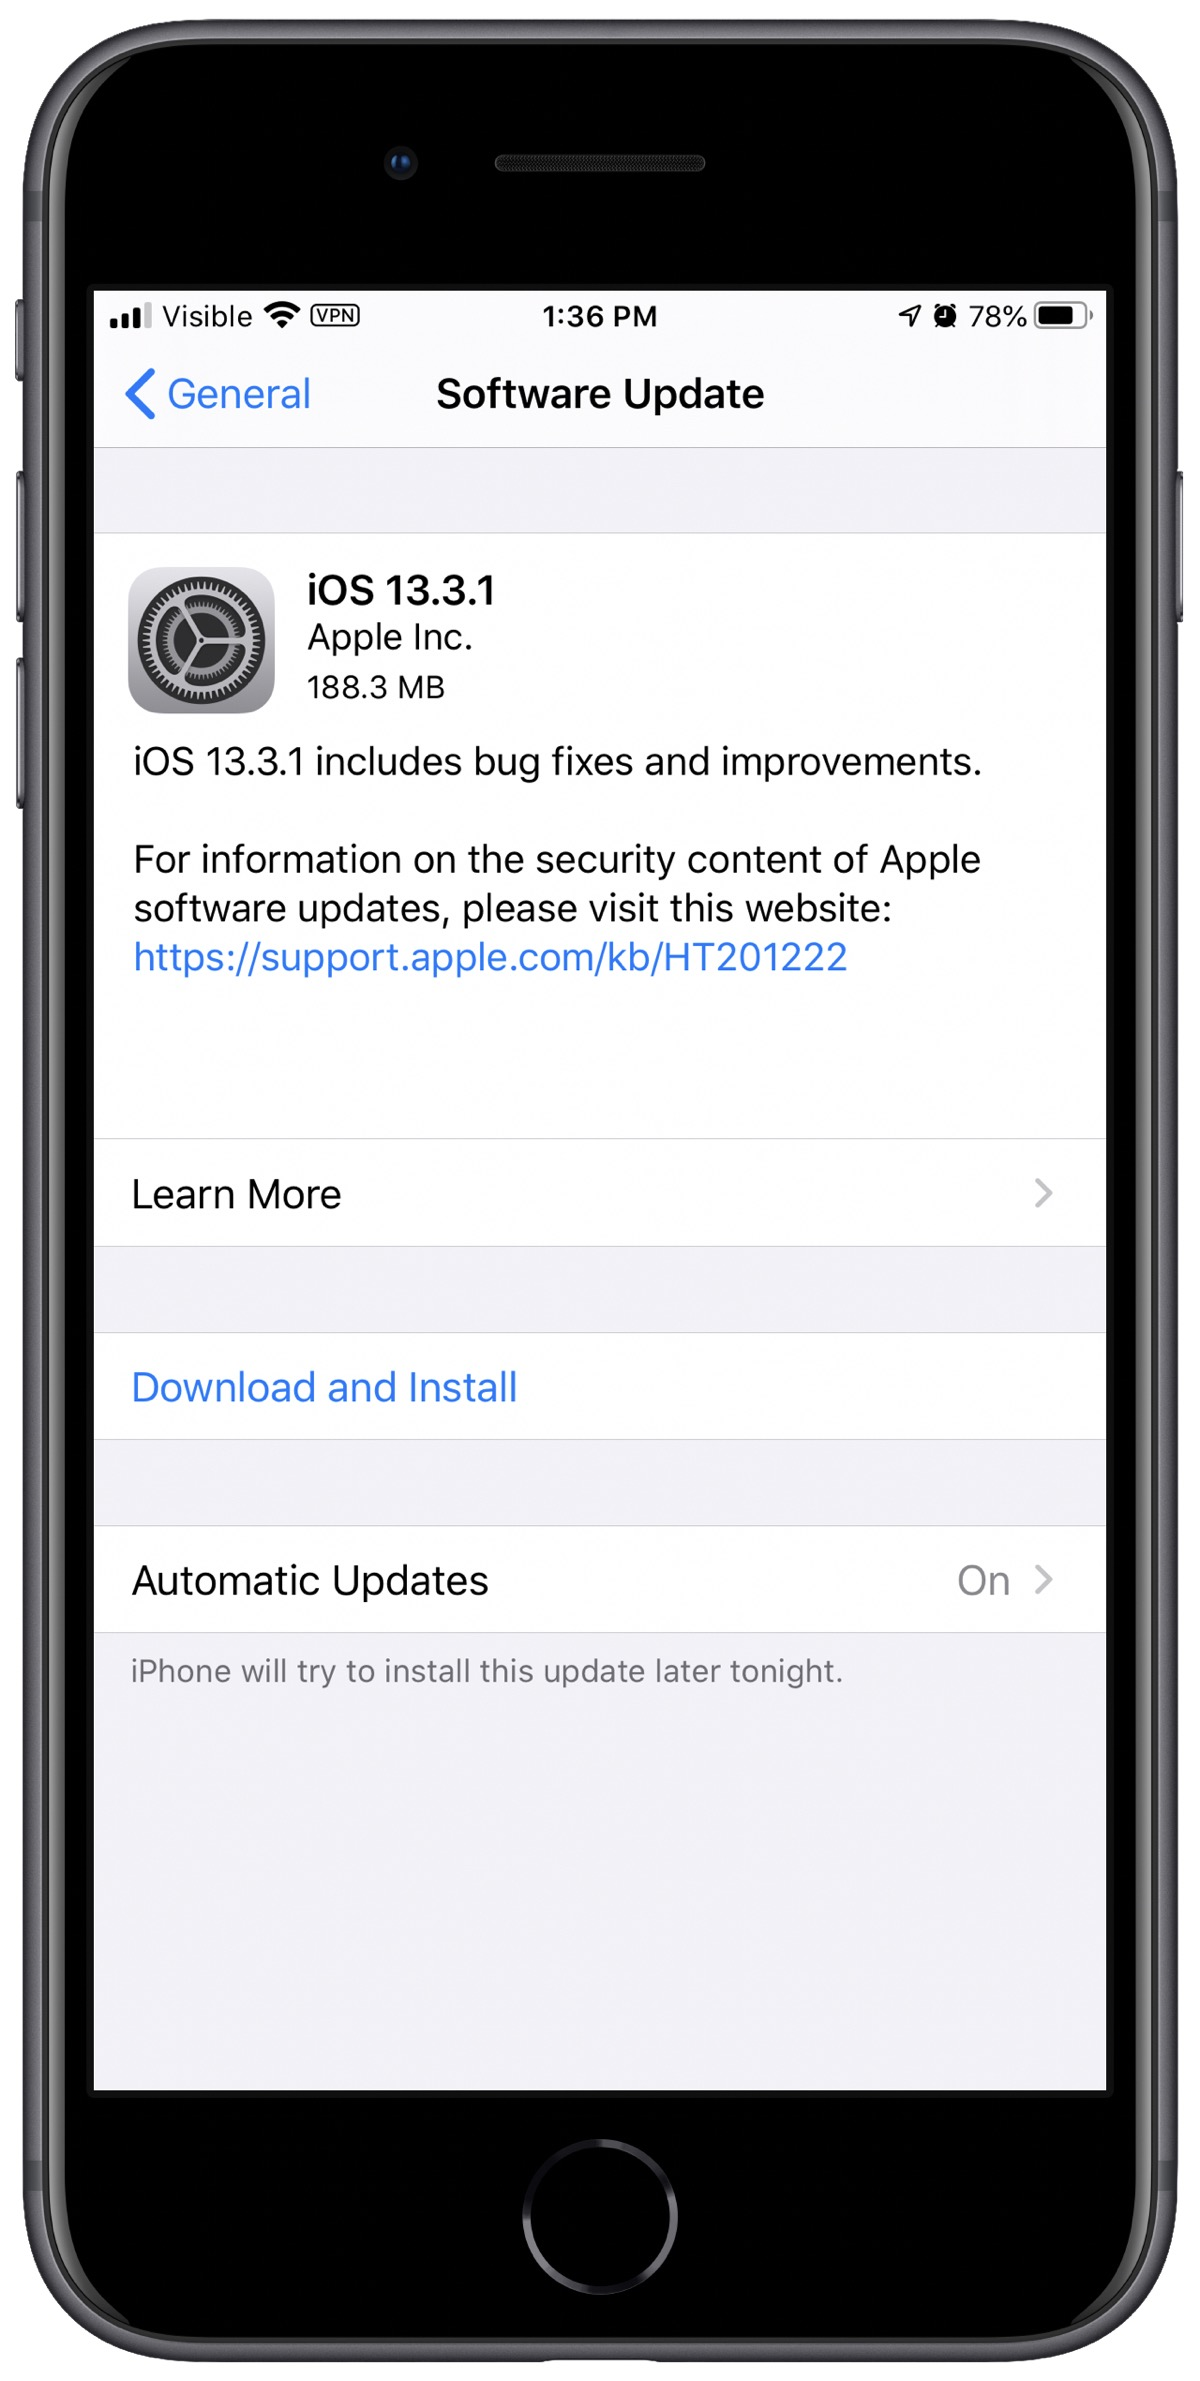 Screenshot of iOS 13.3.1 update